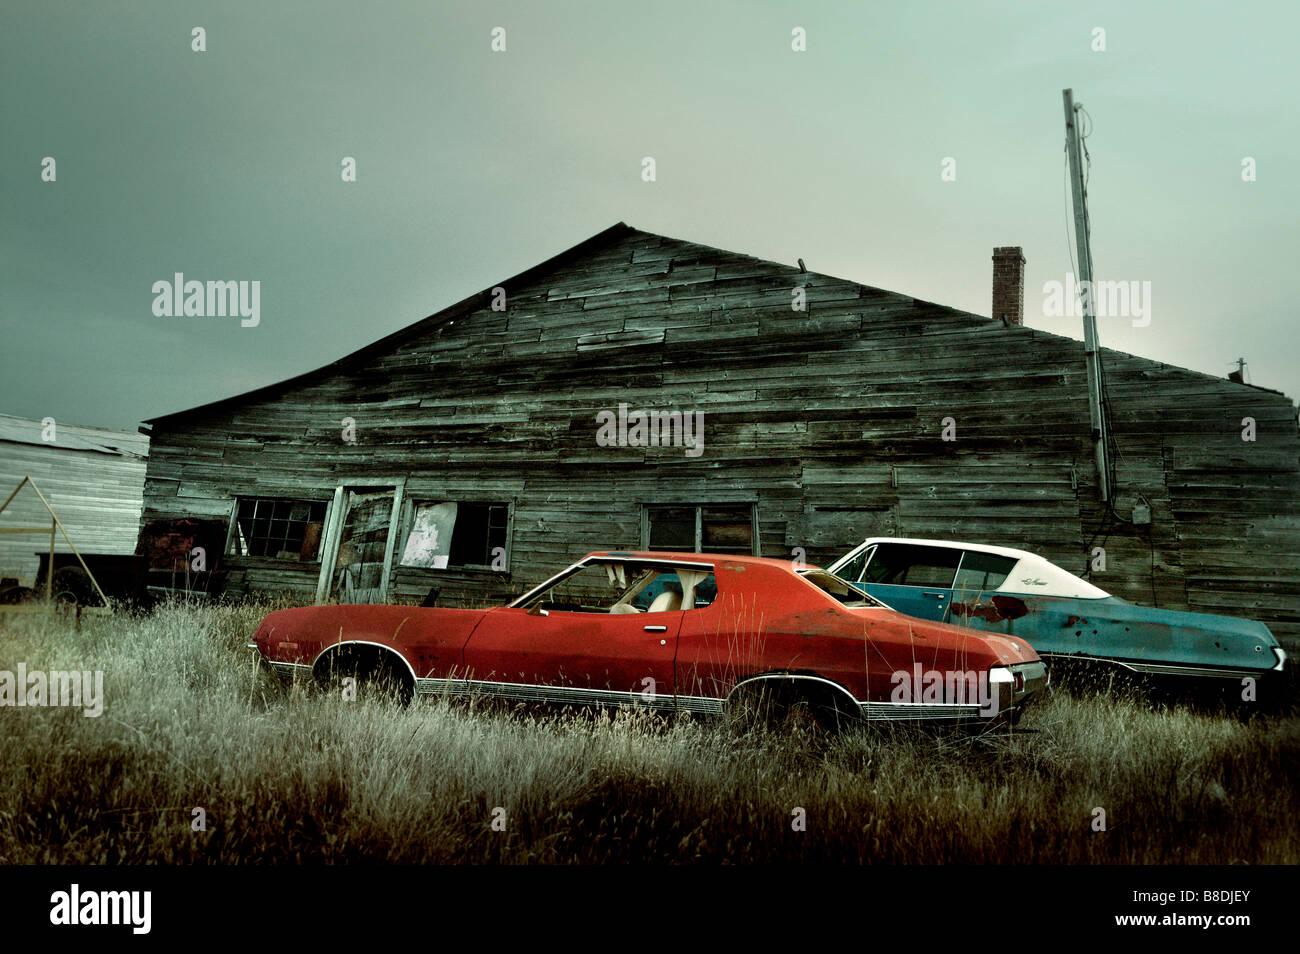 Old cars in rural Saskatchewan, Canada Stock Photo: 22427523 - Alamy